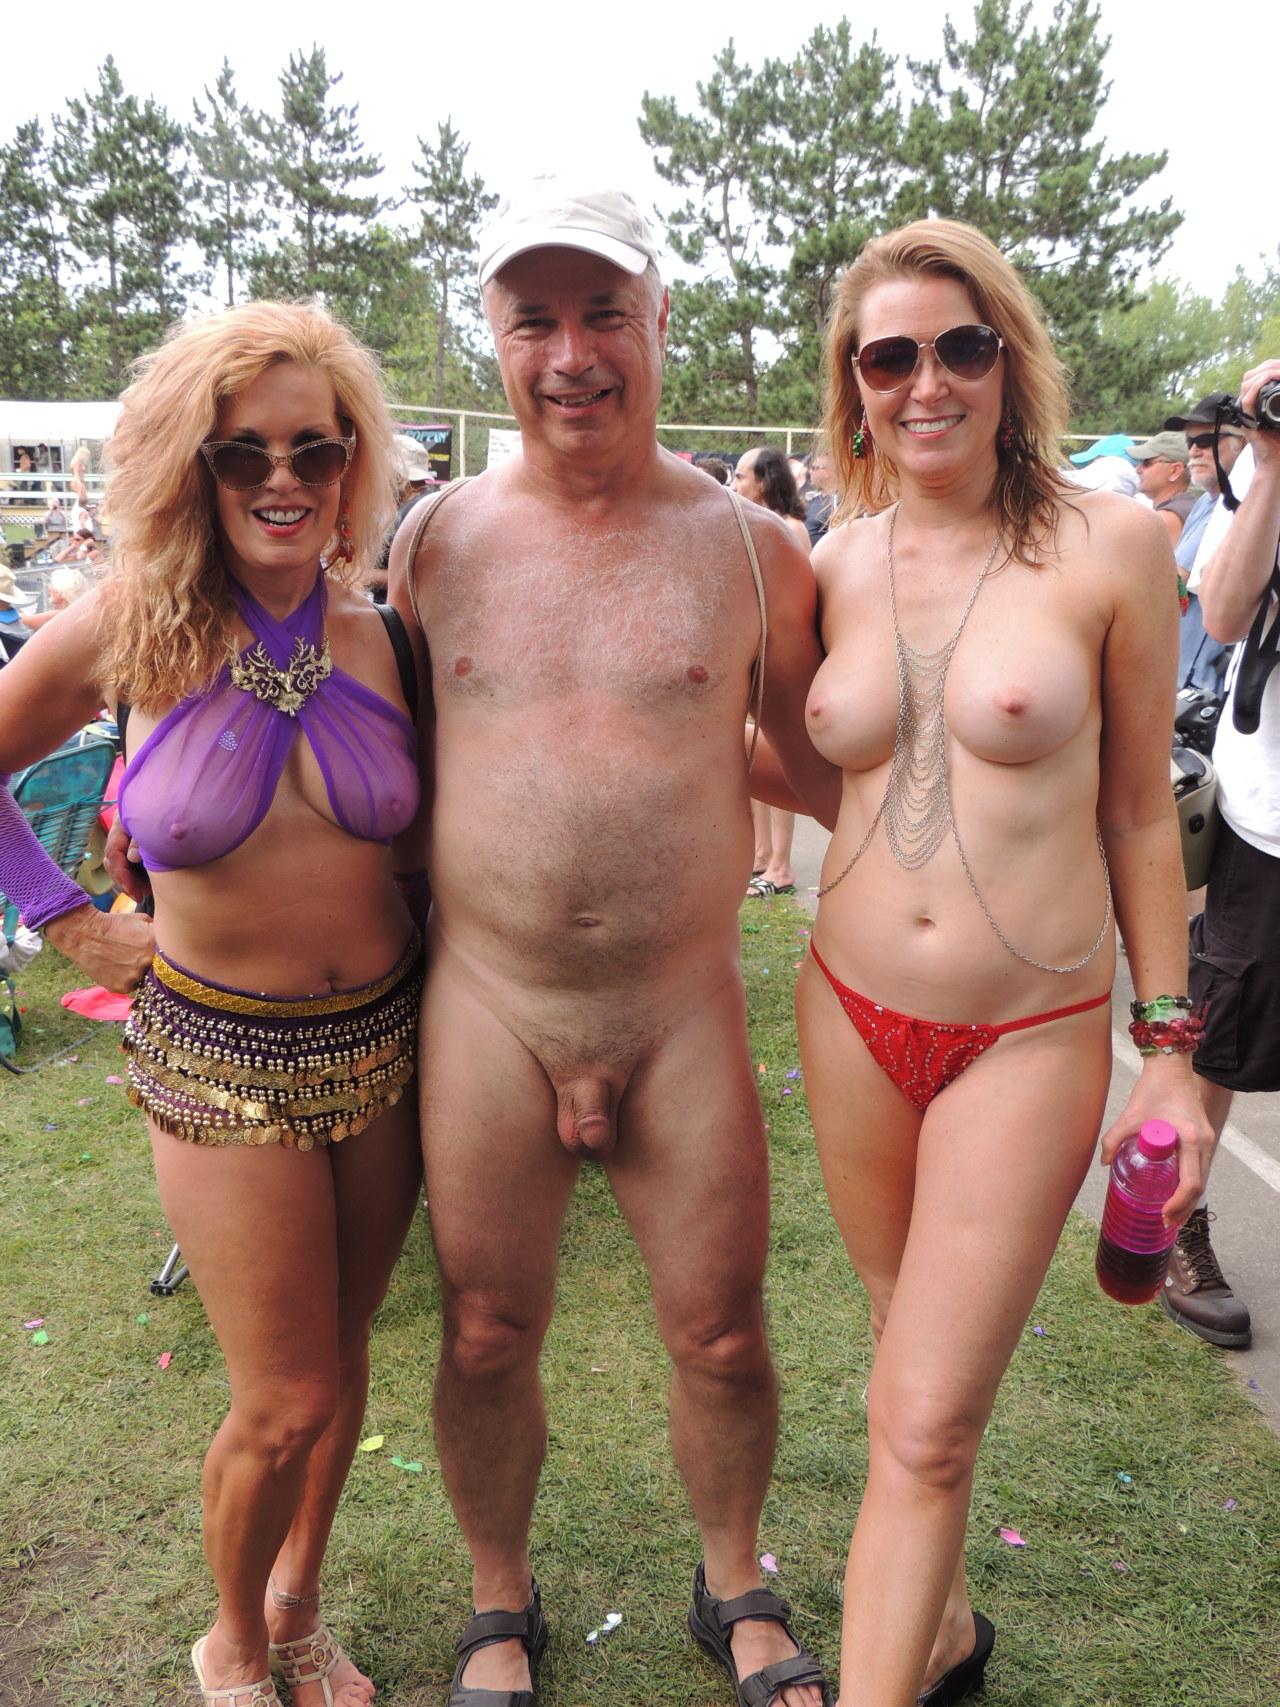 tumblr nude beach sex